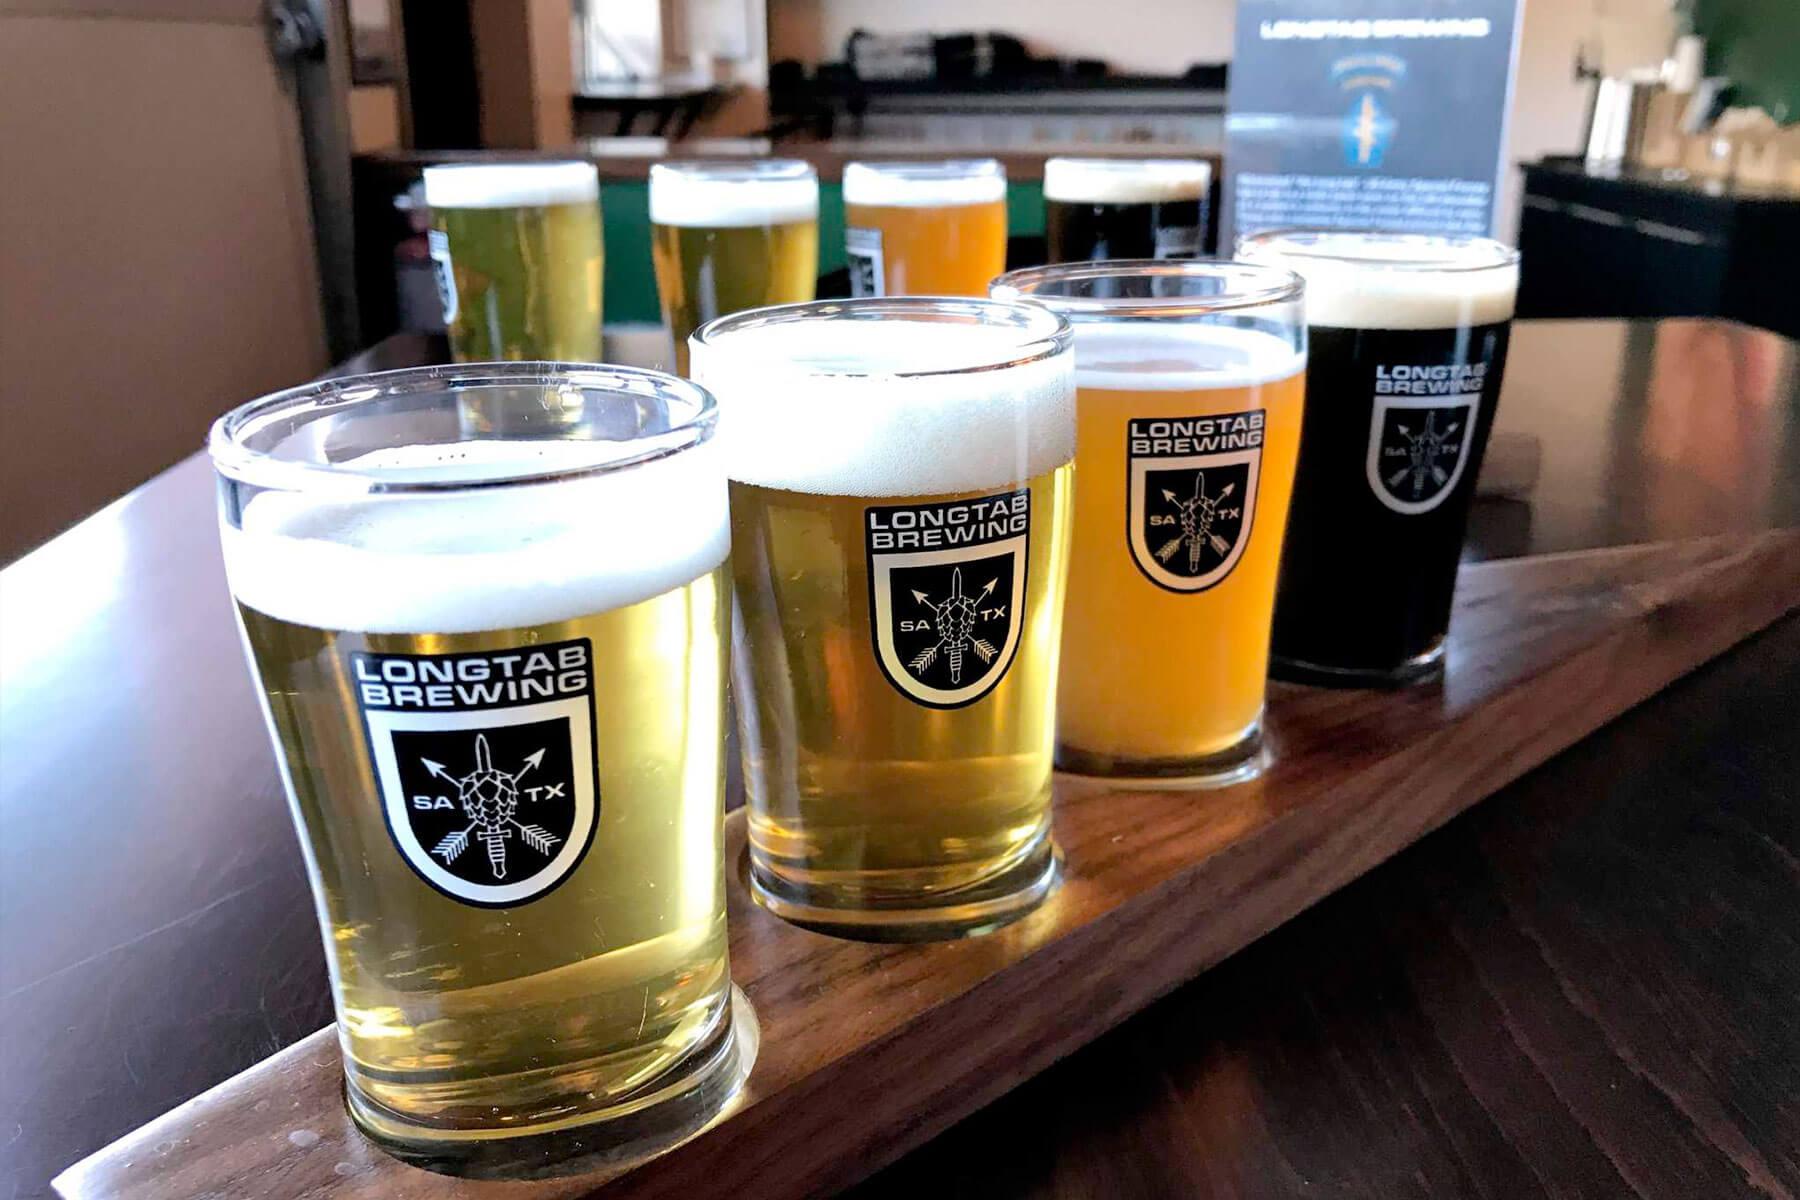 A flight of beers in Longtab Brewing Company branded sampler glasses